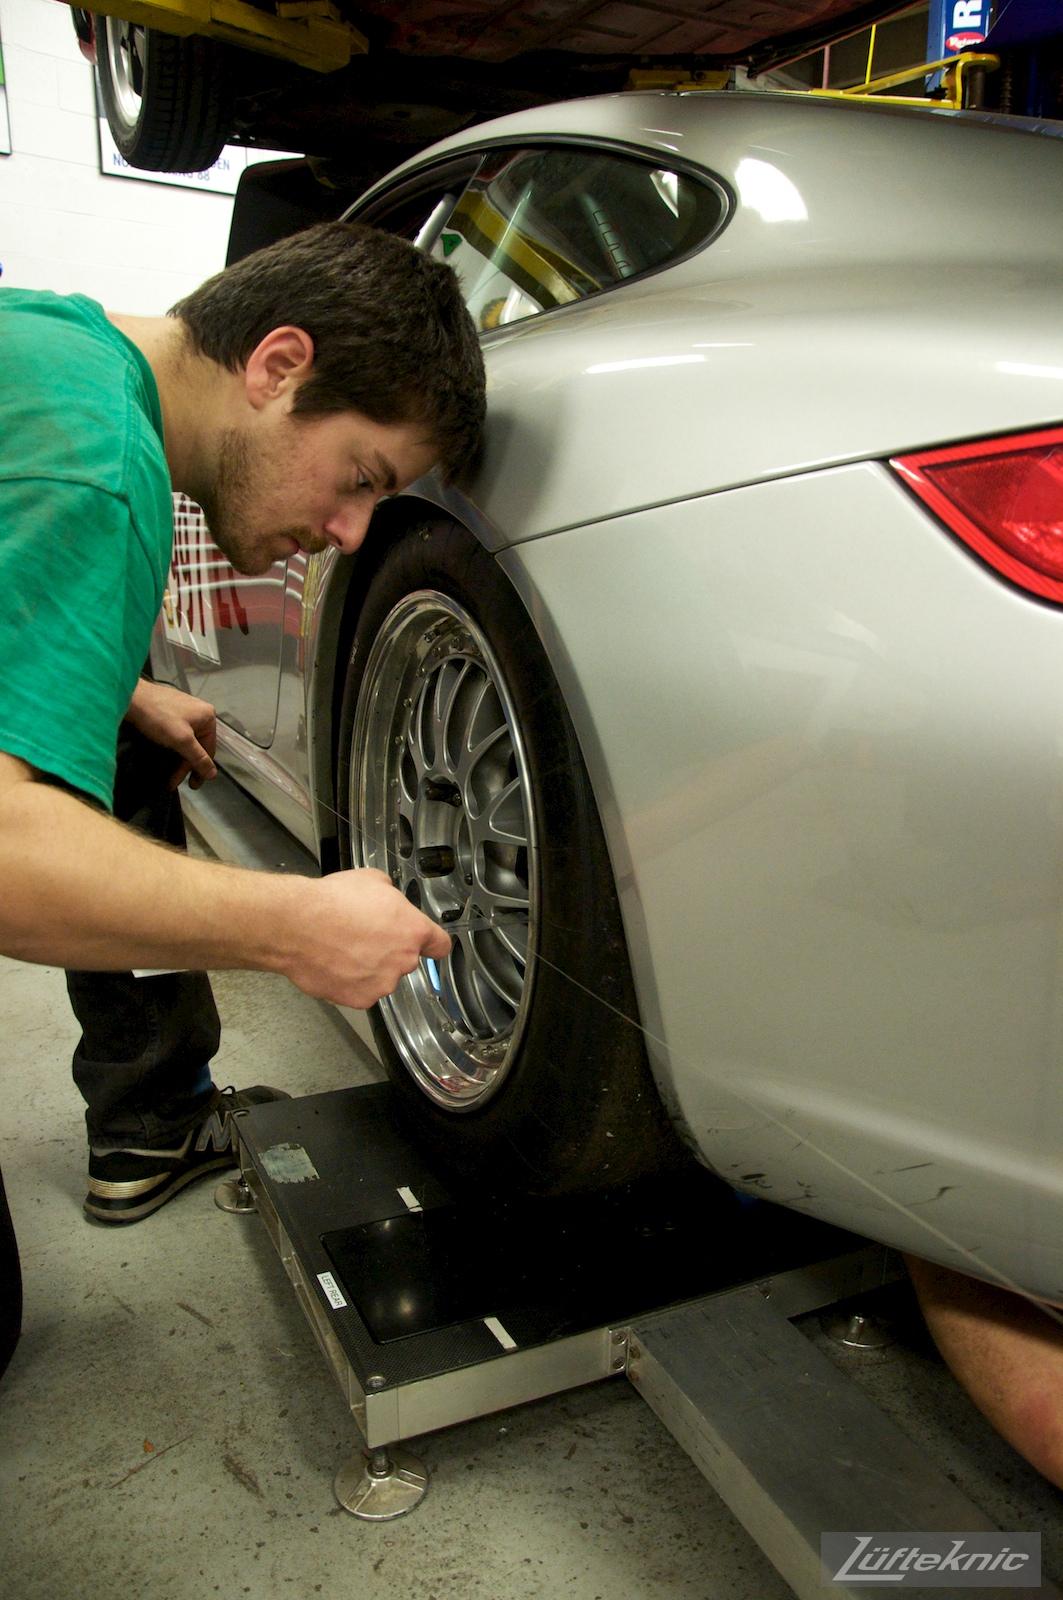 A Lufteknic employee measuring toe alignment settings on a silver Porsche 997 911 race car.